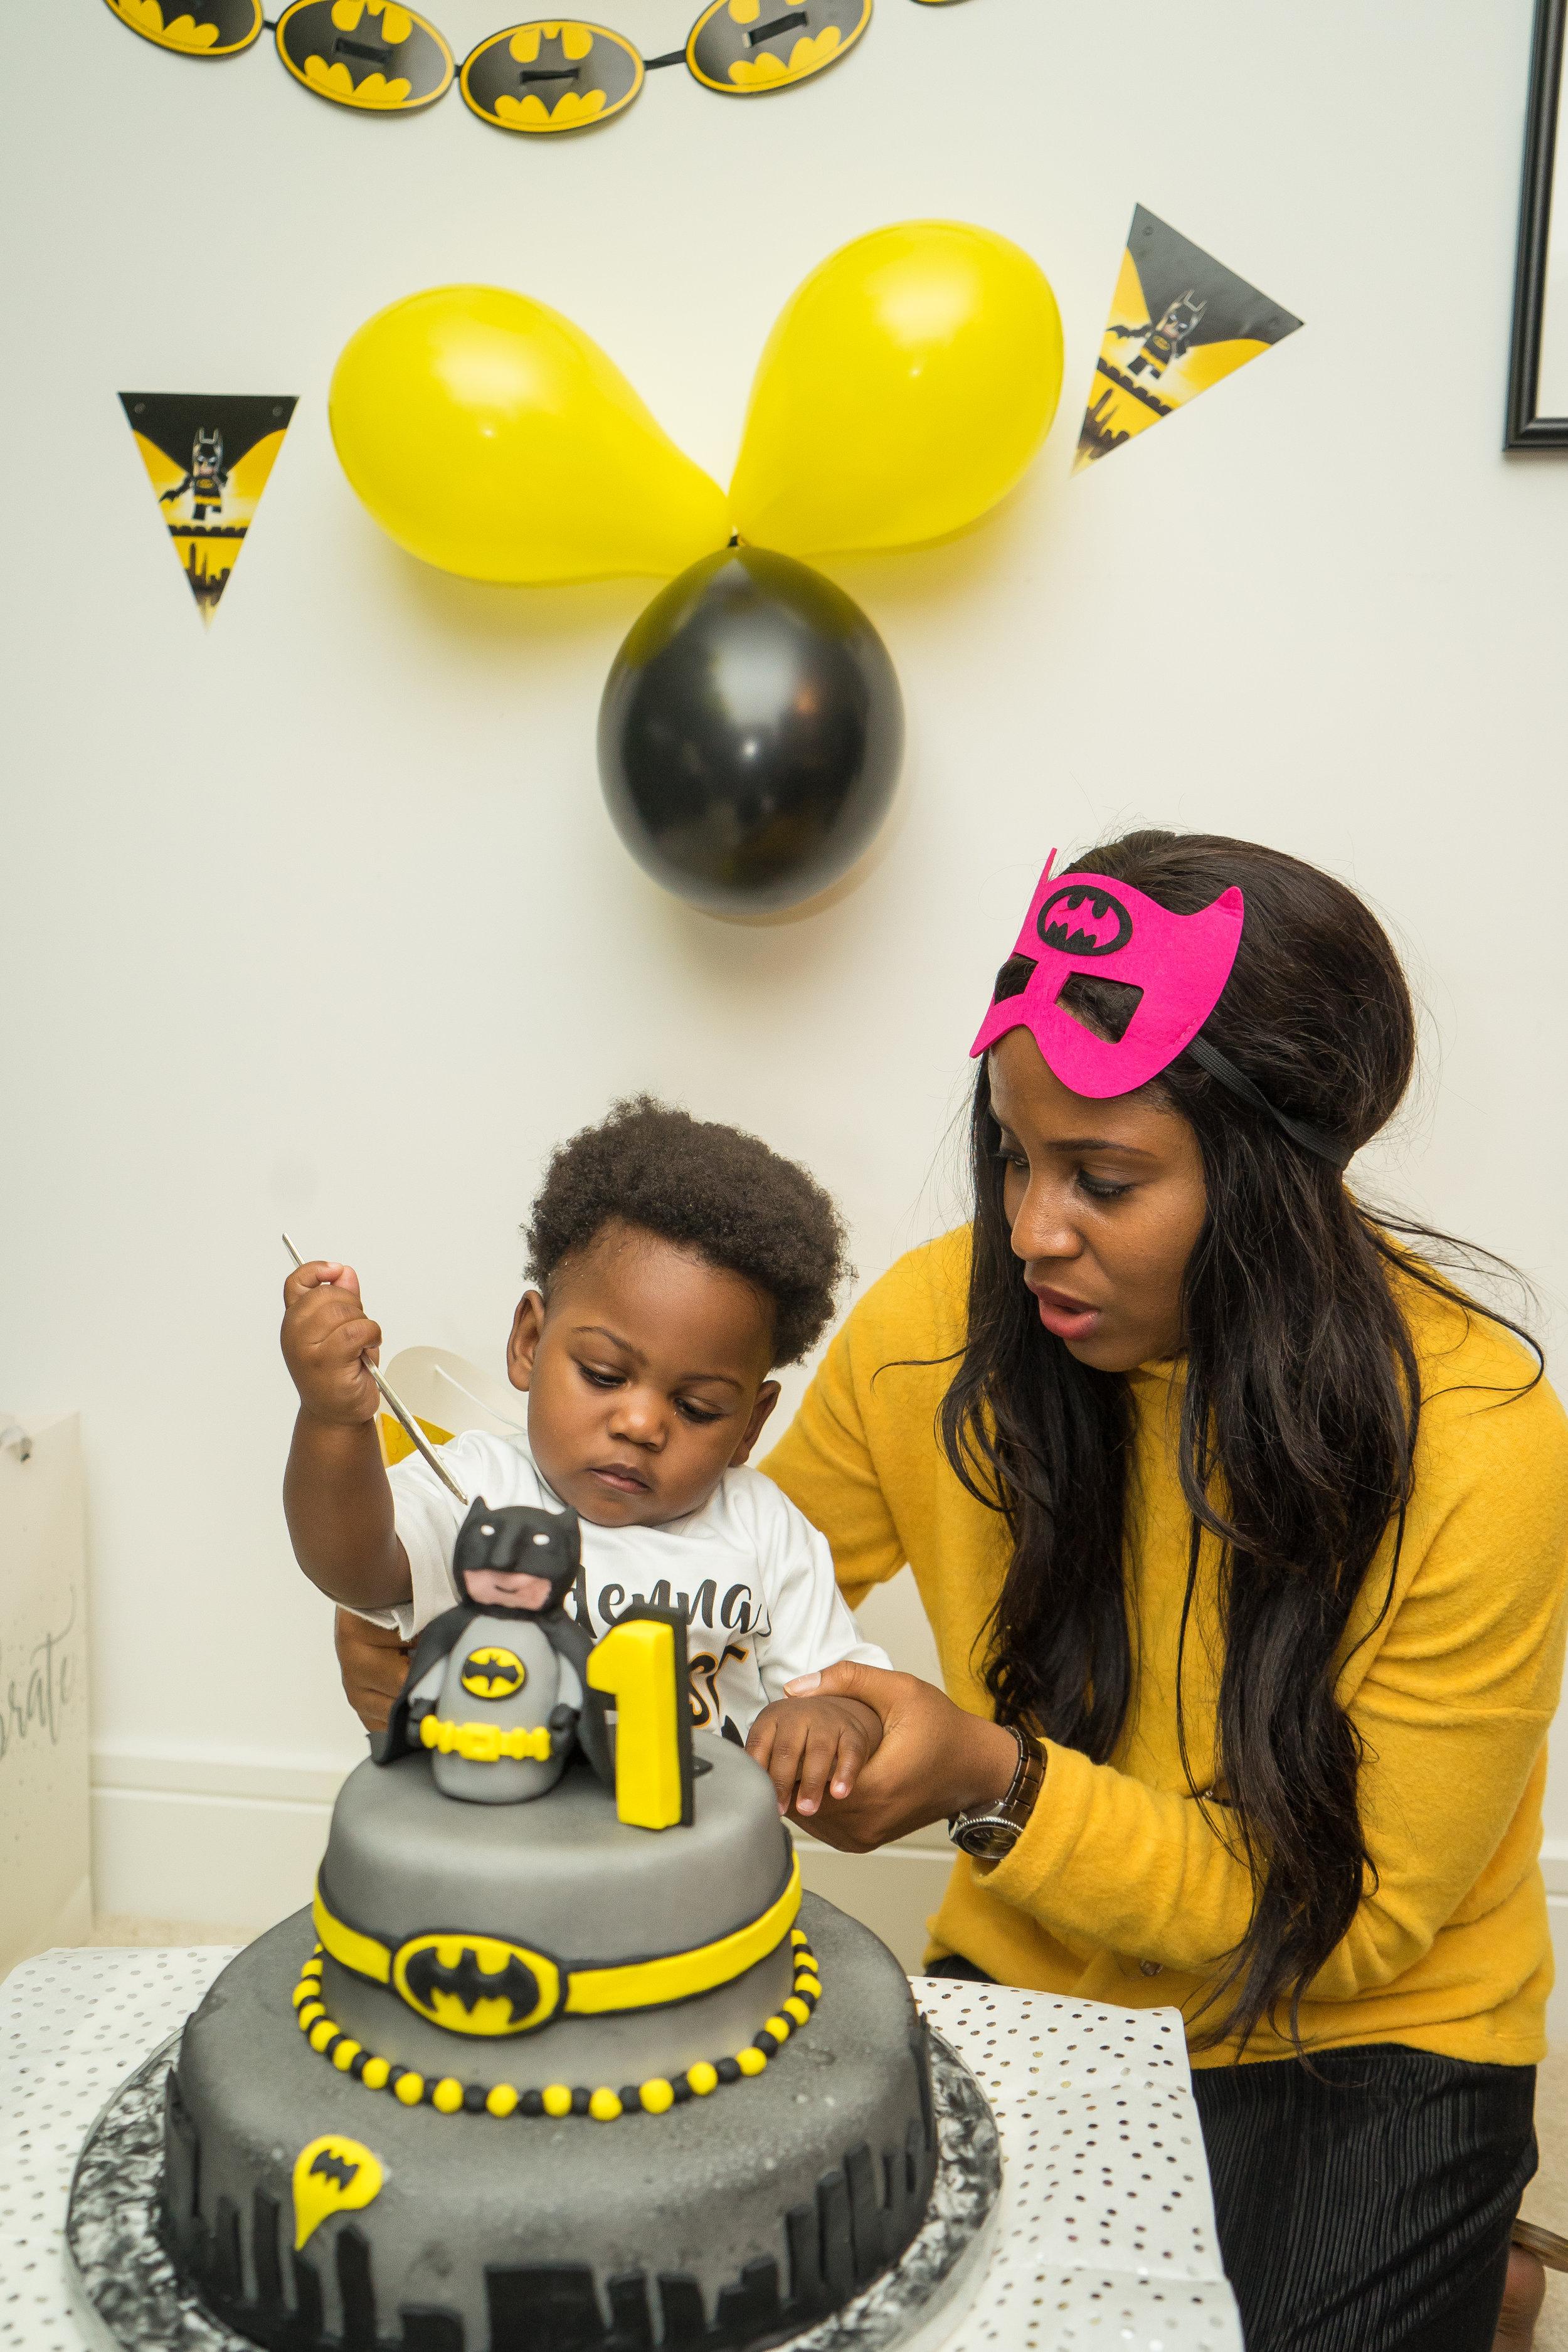 2. lego batman birthday cake .jpg